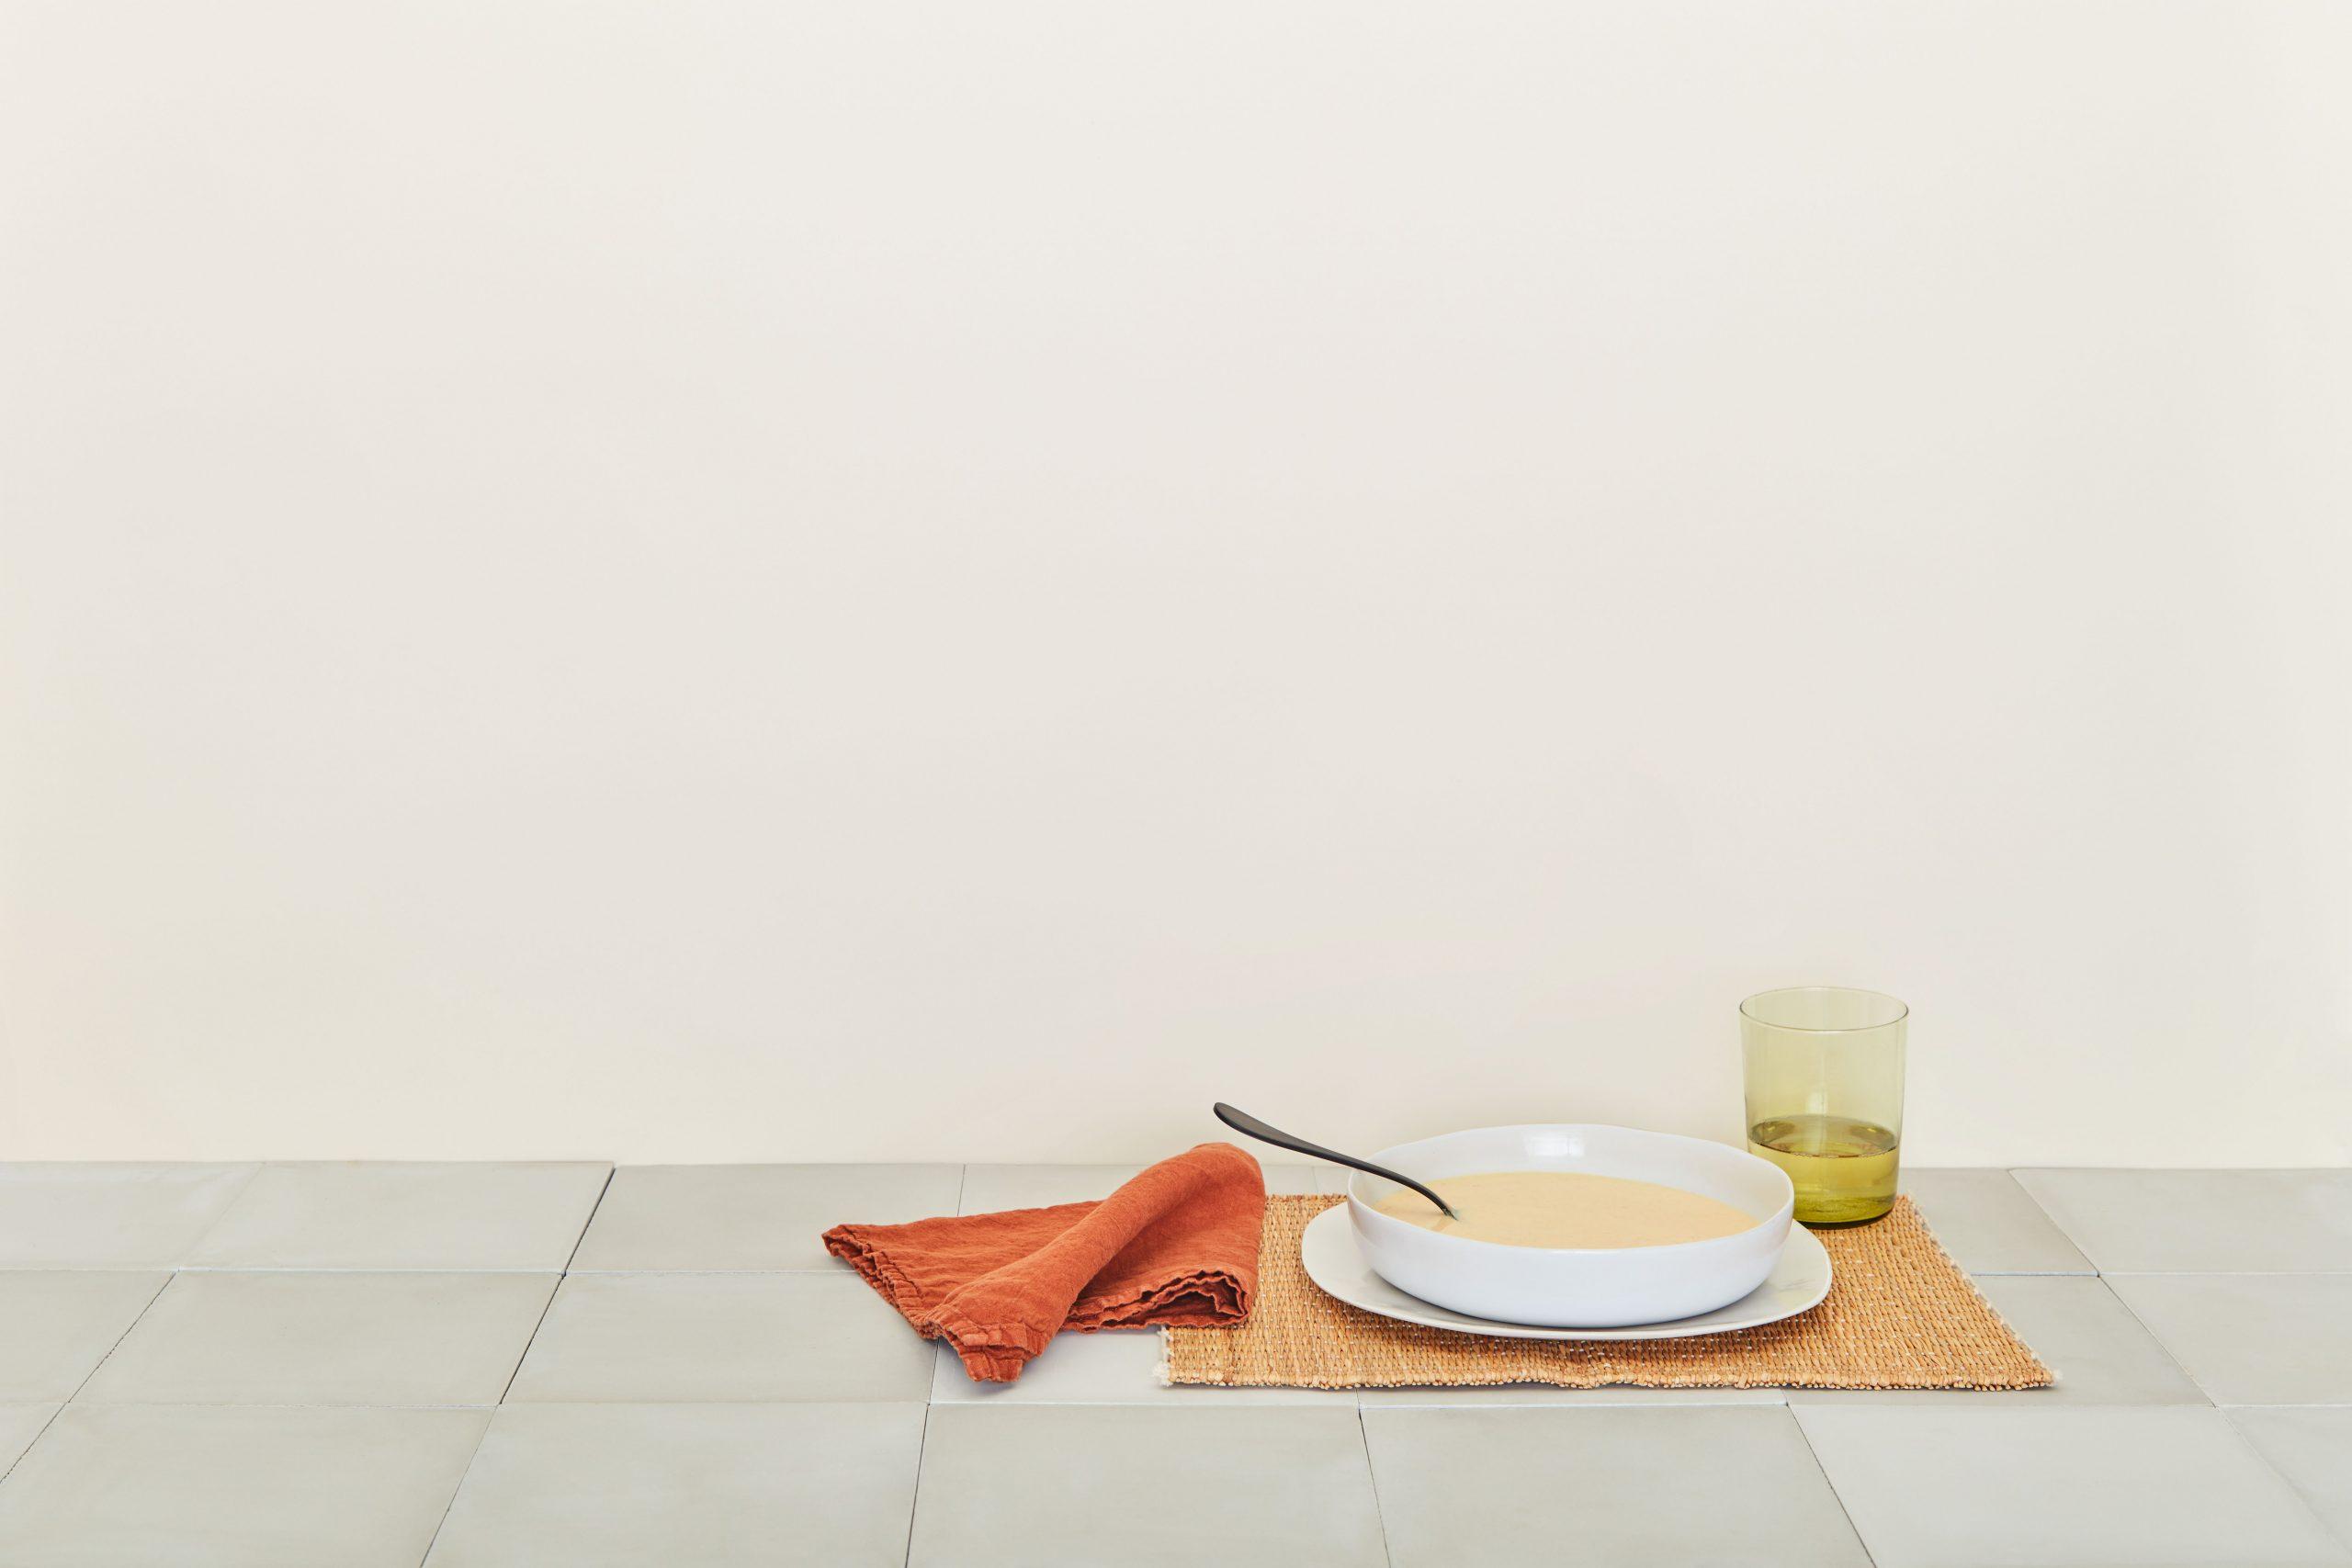 Hawkins NY Organic Plates